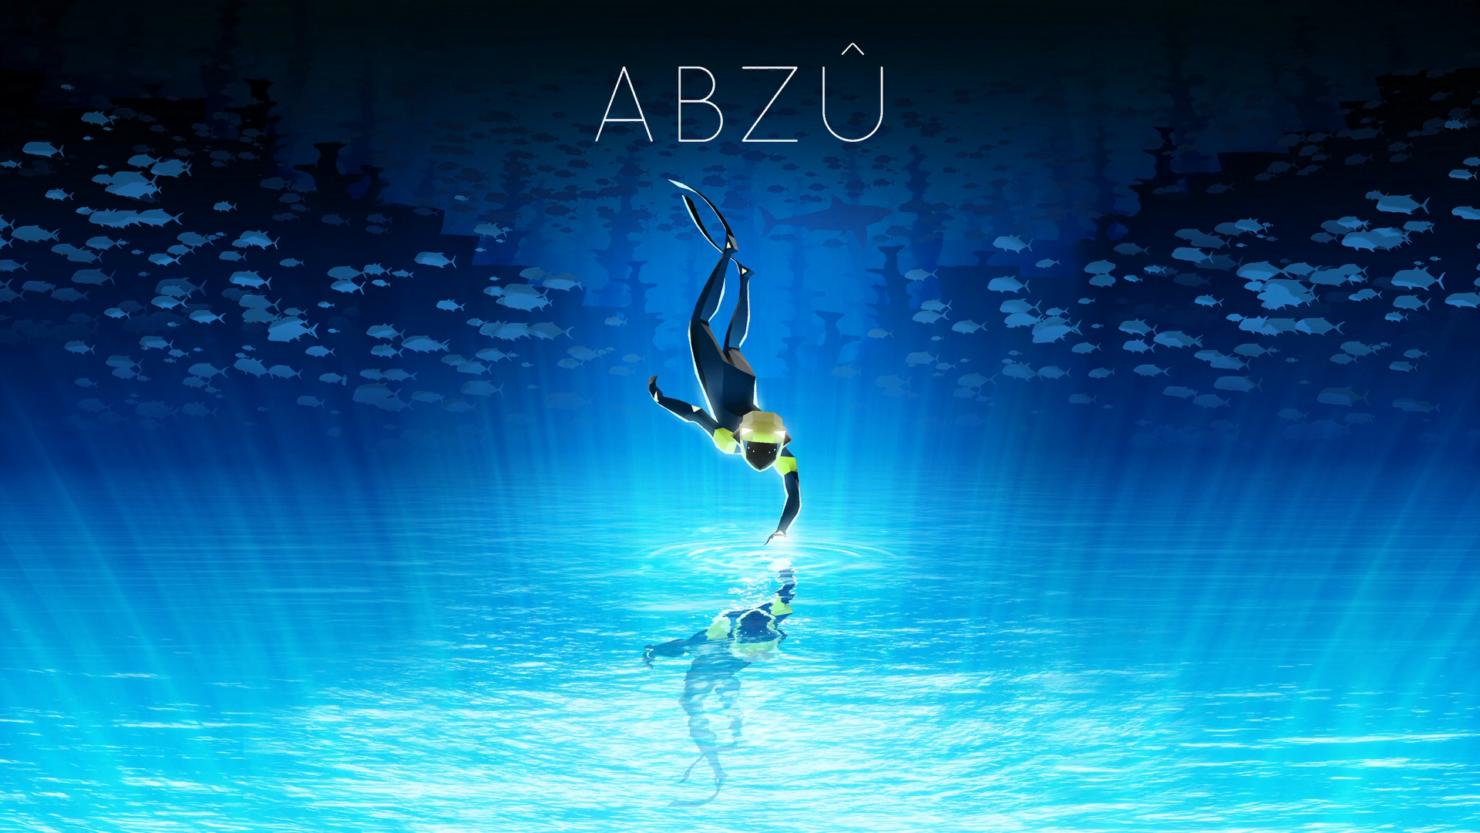 Abzu PS4 Pro